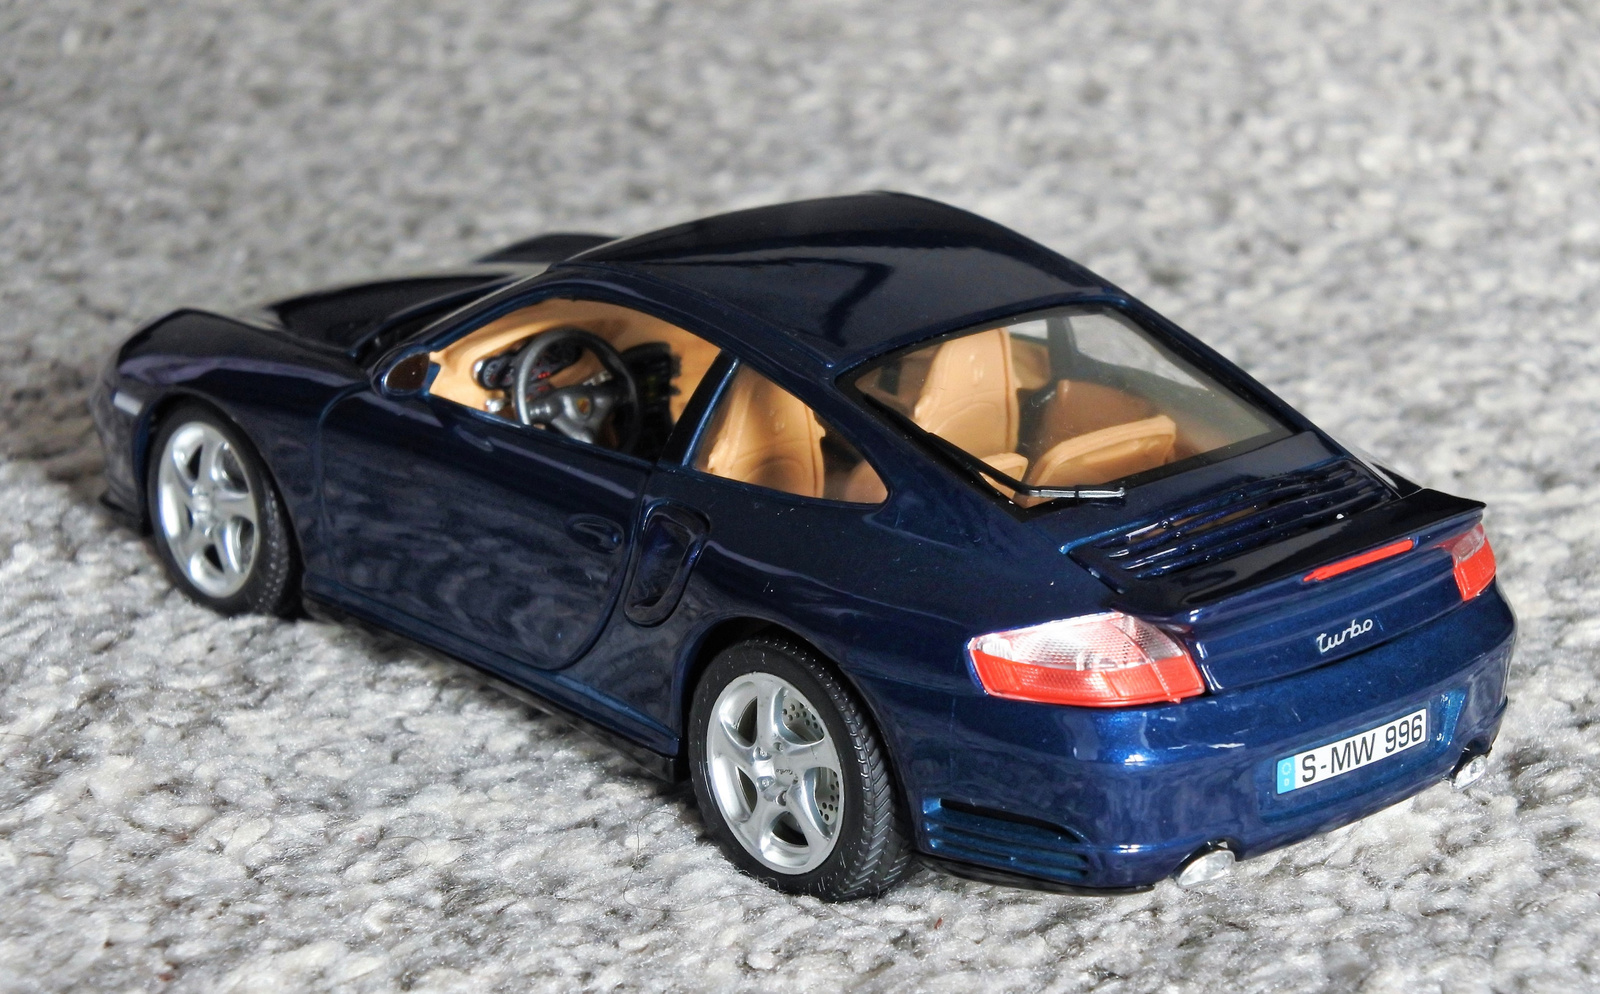 Porsche 911 Turbo 1:18